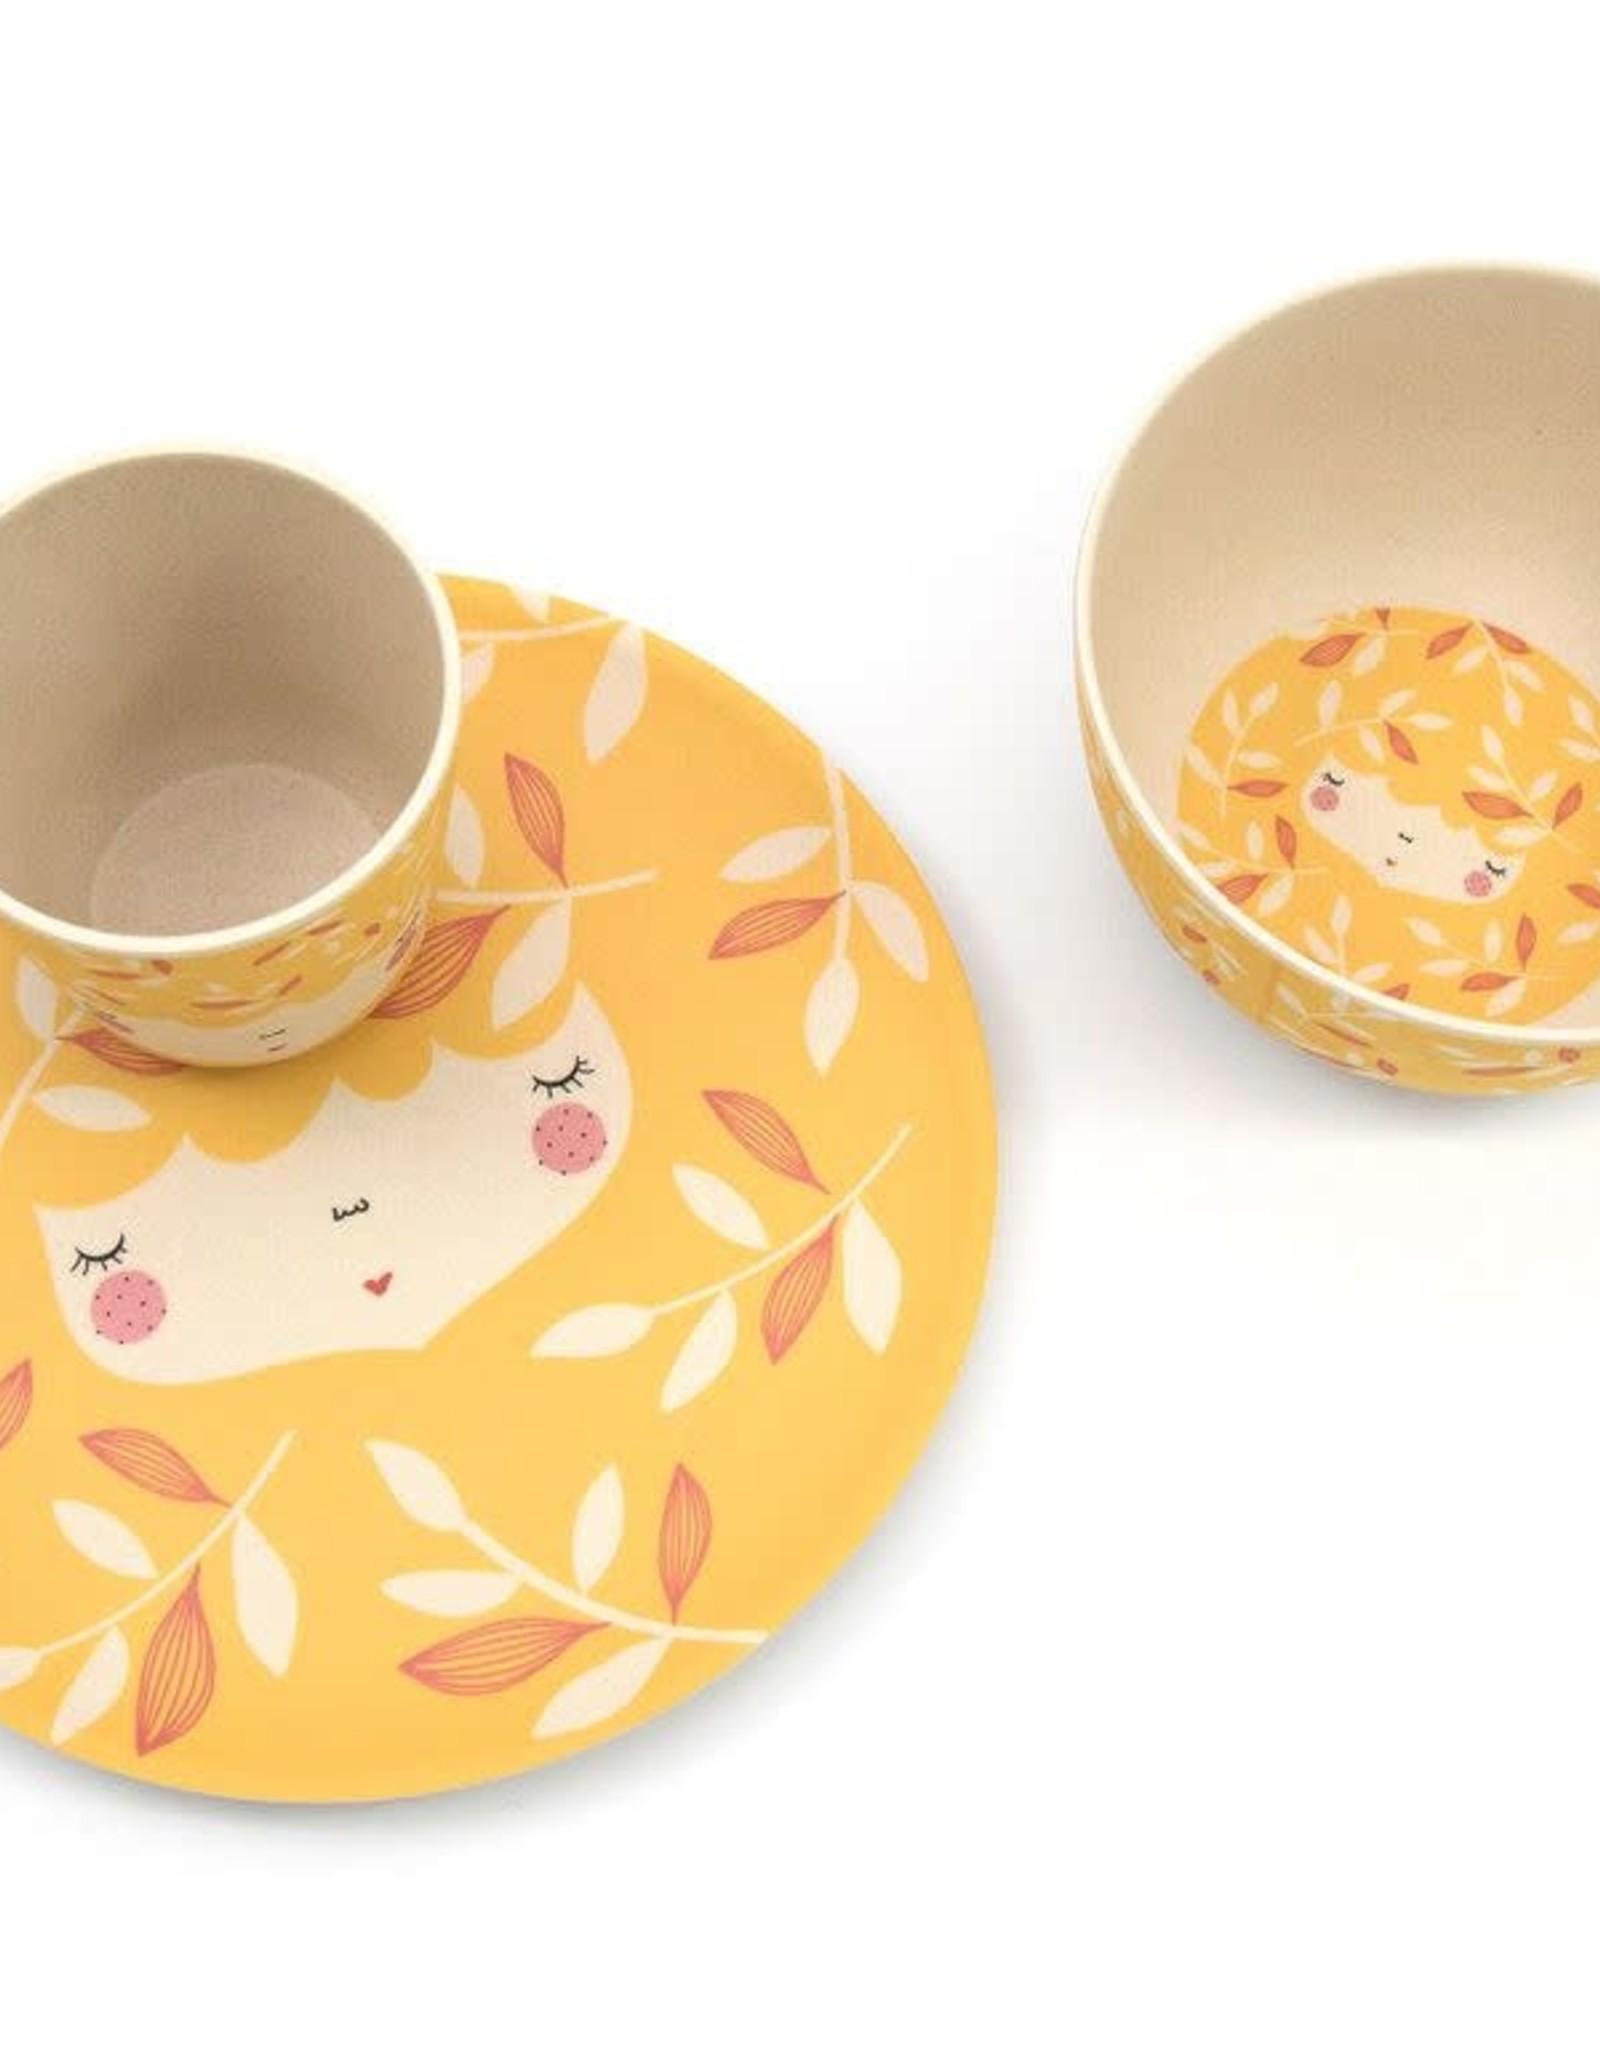 Yuunaa Bamboo Kids Set - Marinska Flower Face Yellow- 3 pieces